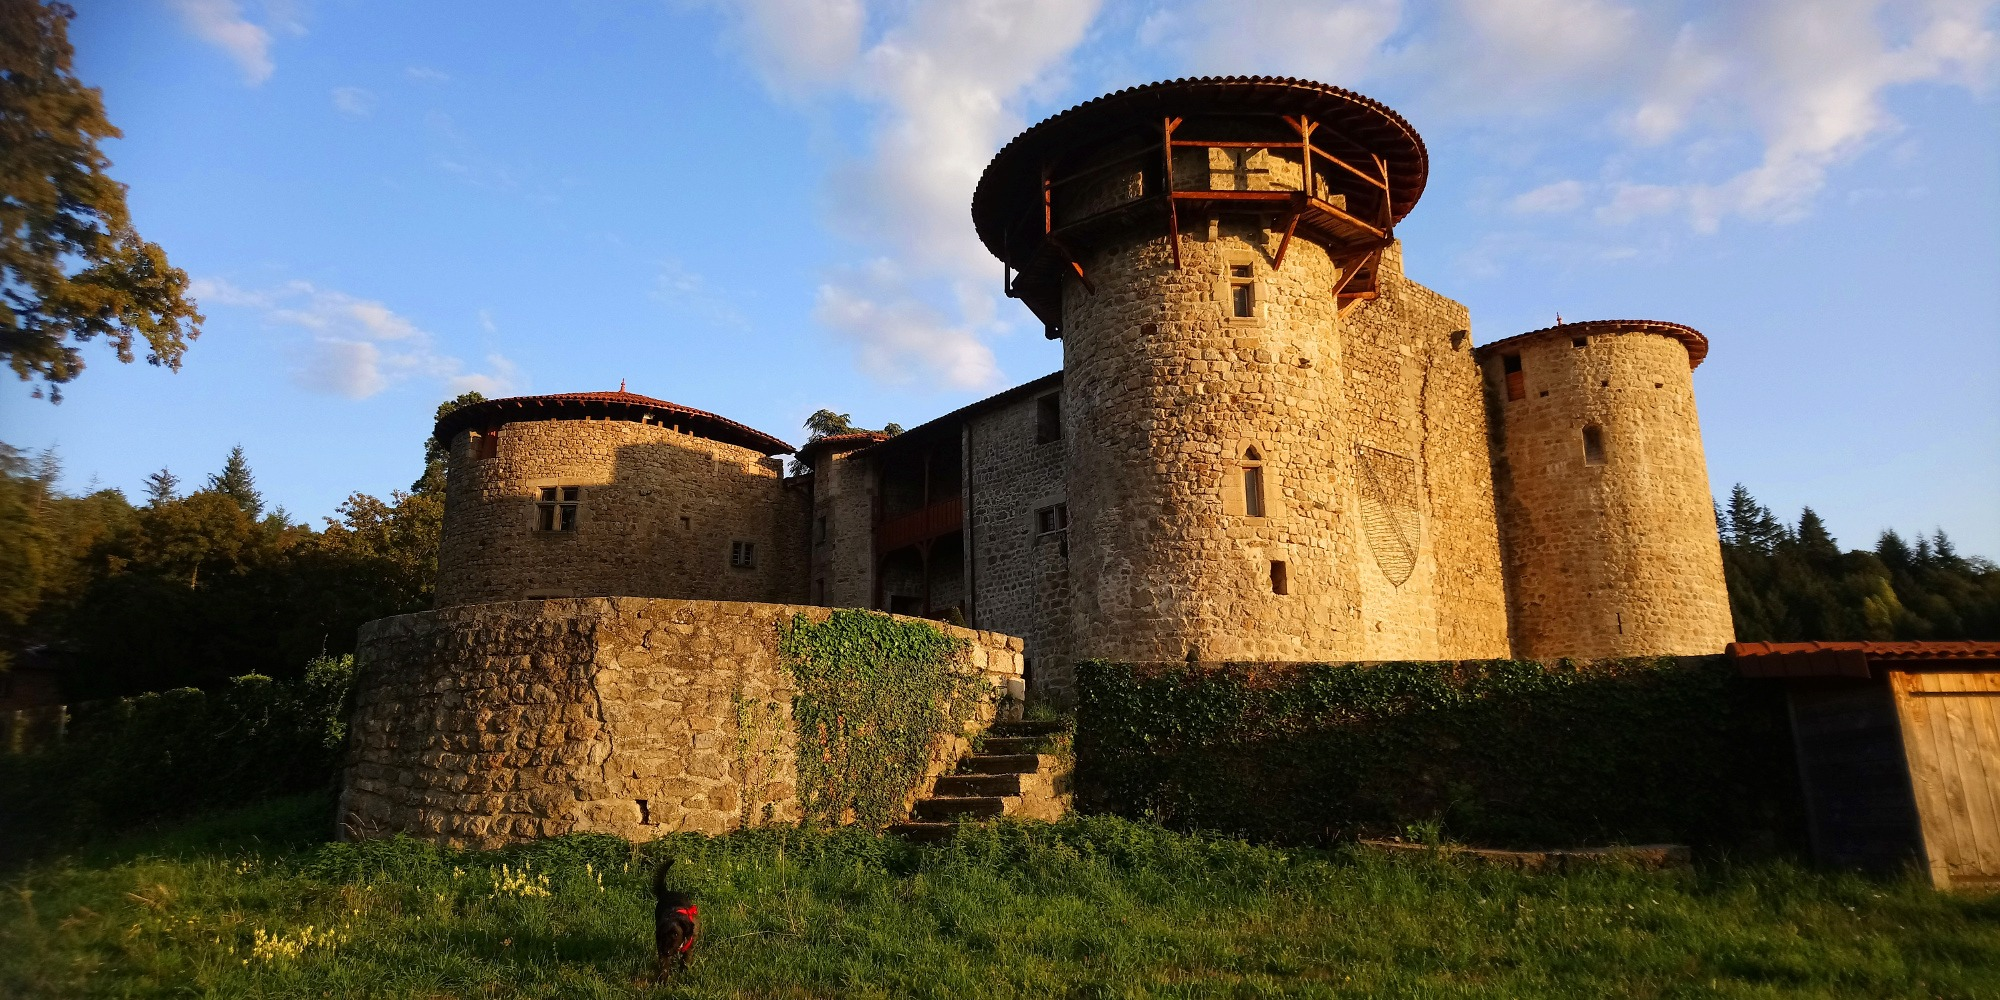 Le Chateau de La Chèze, Le Cheylard